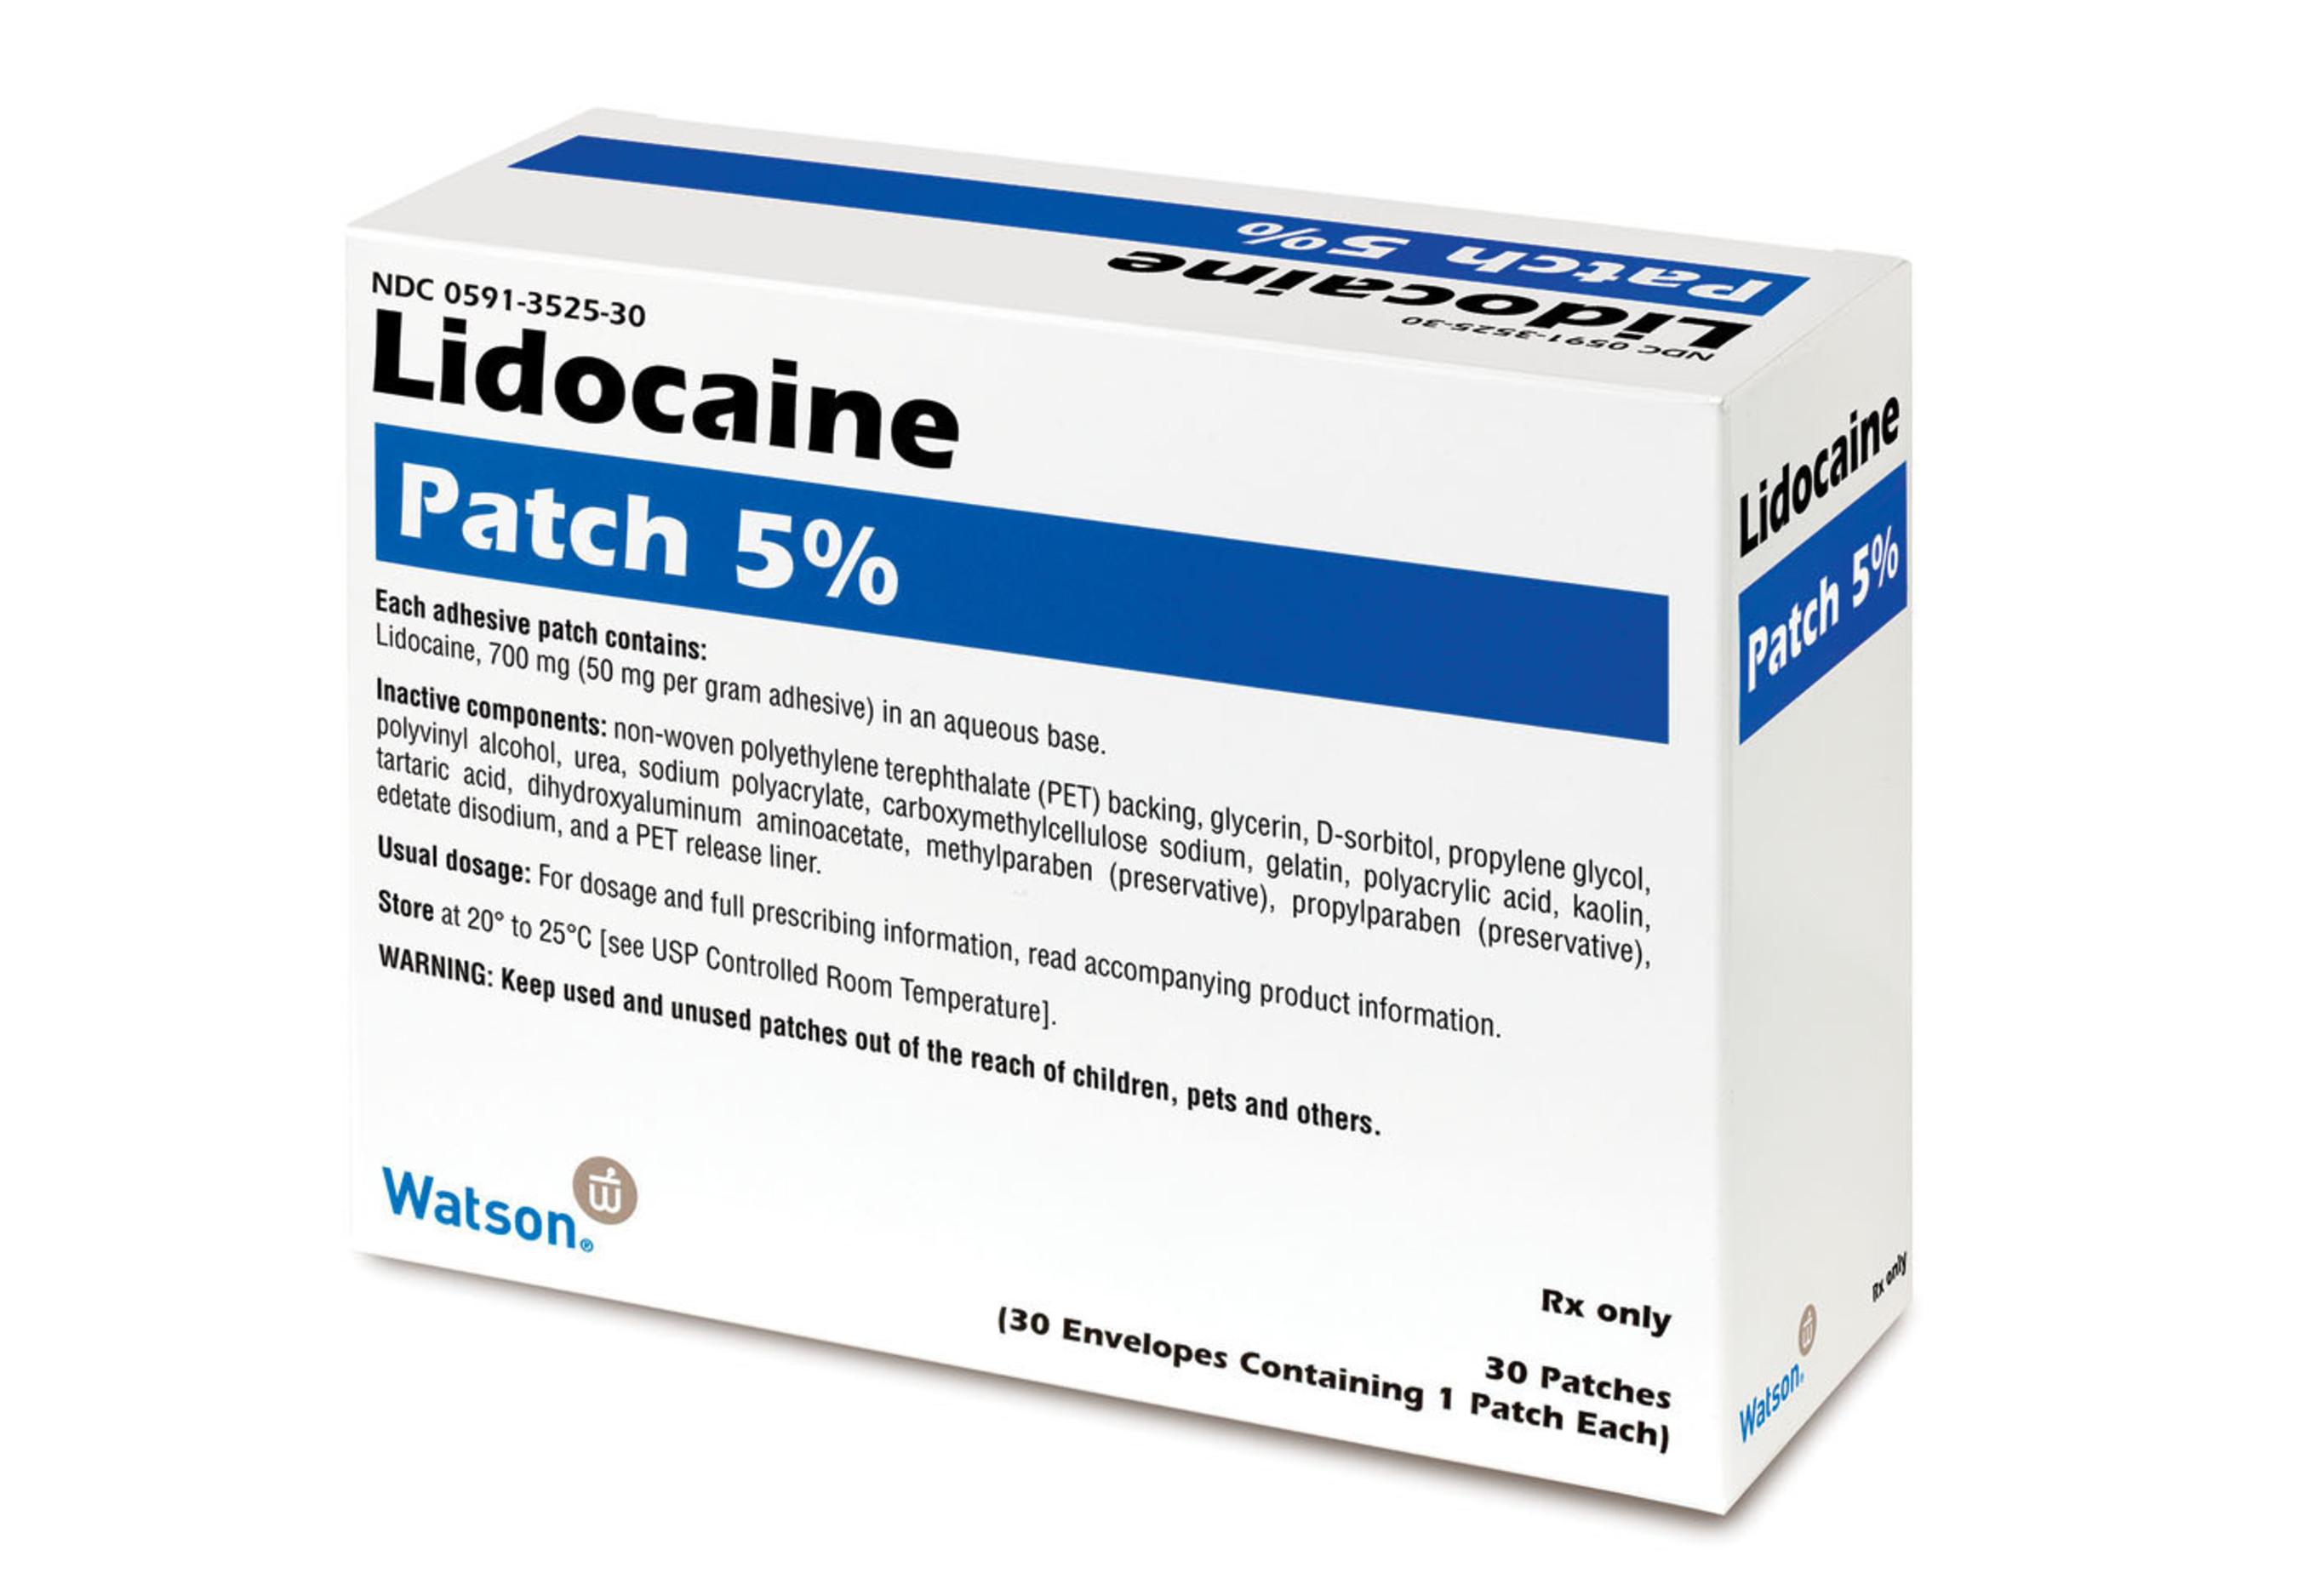 Actavis' Lidocaine Topical Patch 5%.(PRNewsFoto/Actavis, Inc.) (PRNewsFoto/ACTAVIS, INC.)